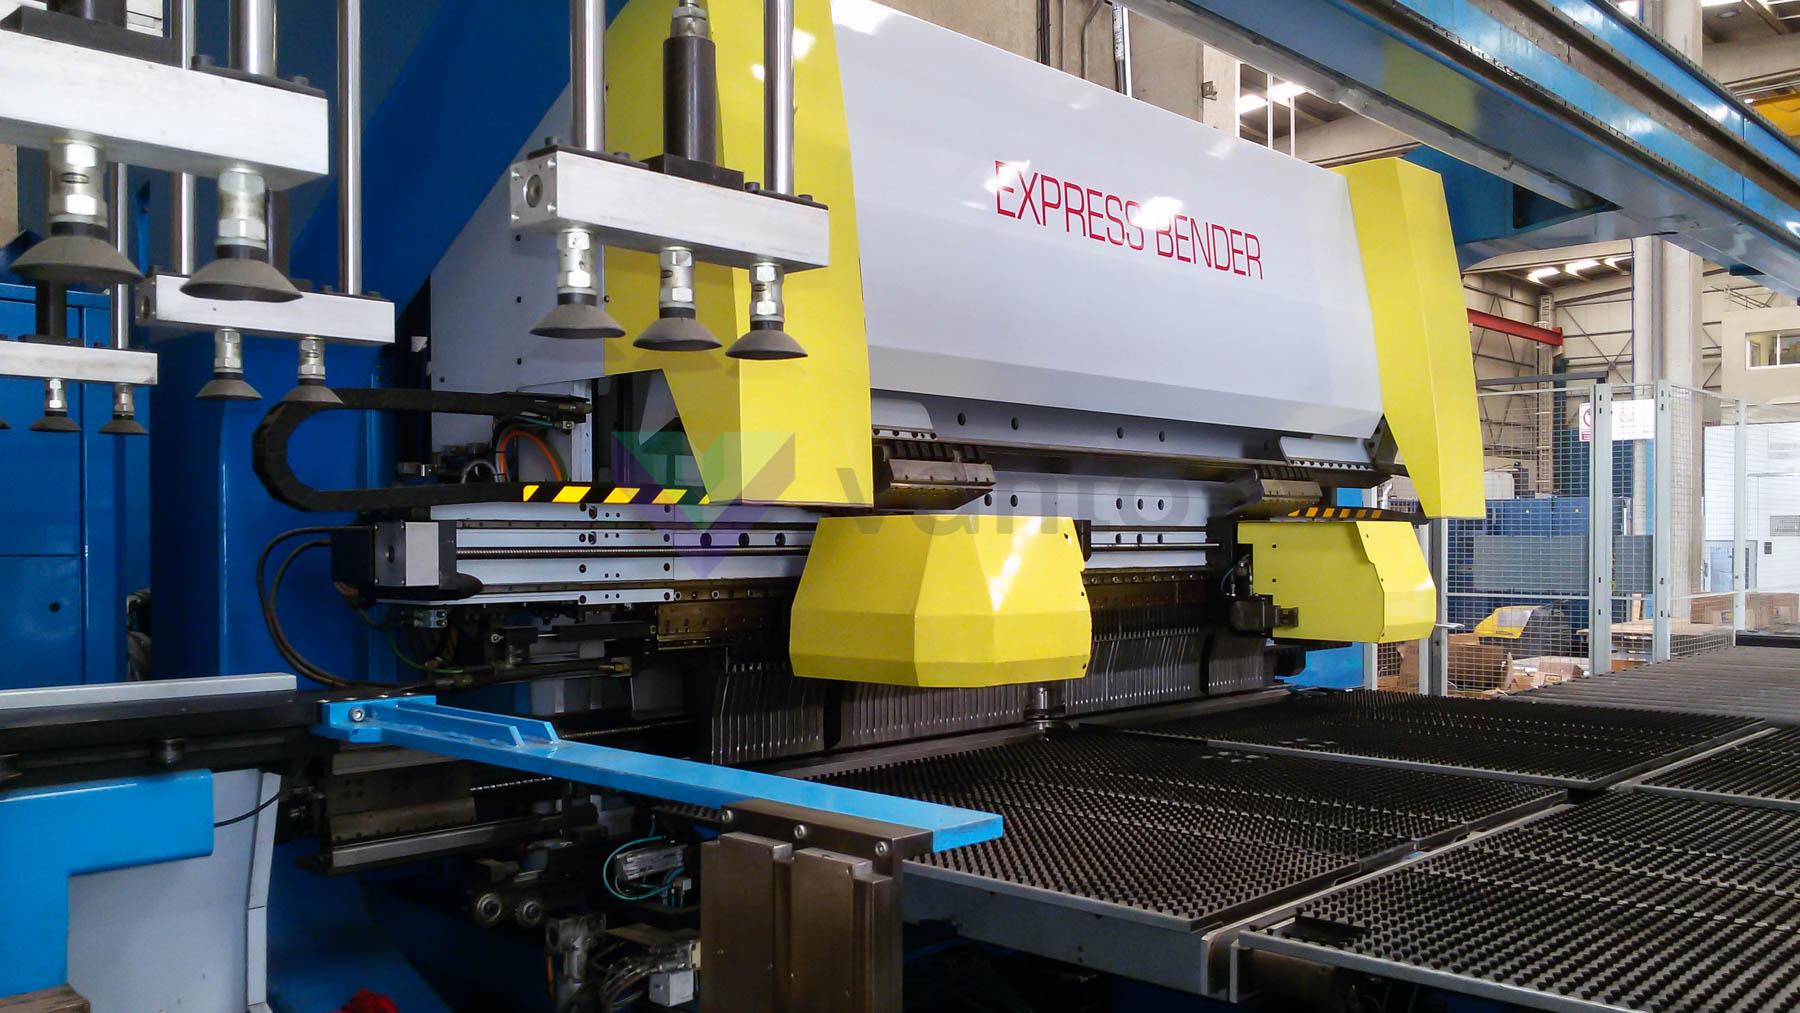 Paneladora automática CNC FINN POWER EB5 200 (2006) id10105